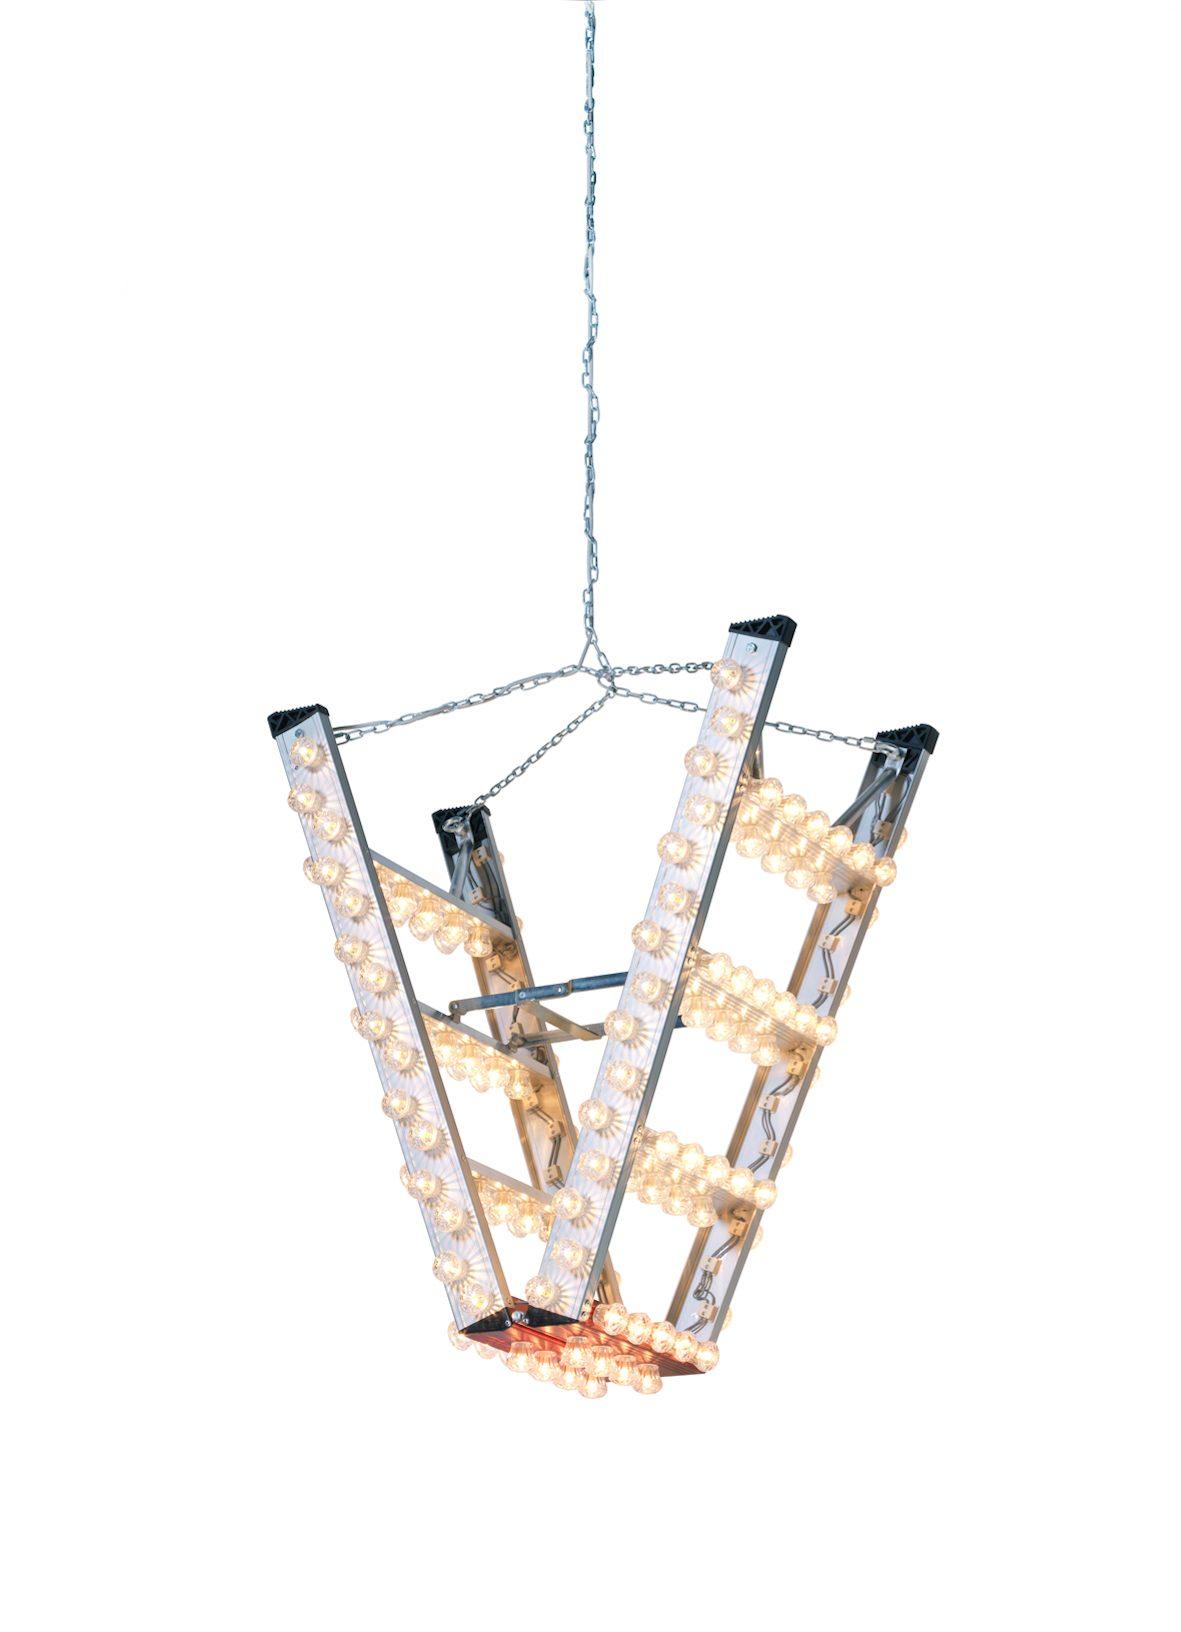 DHPH Downstairs light dimbaar 4 step led Bertjan Pot – Gimmii